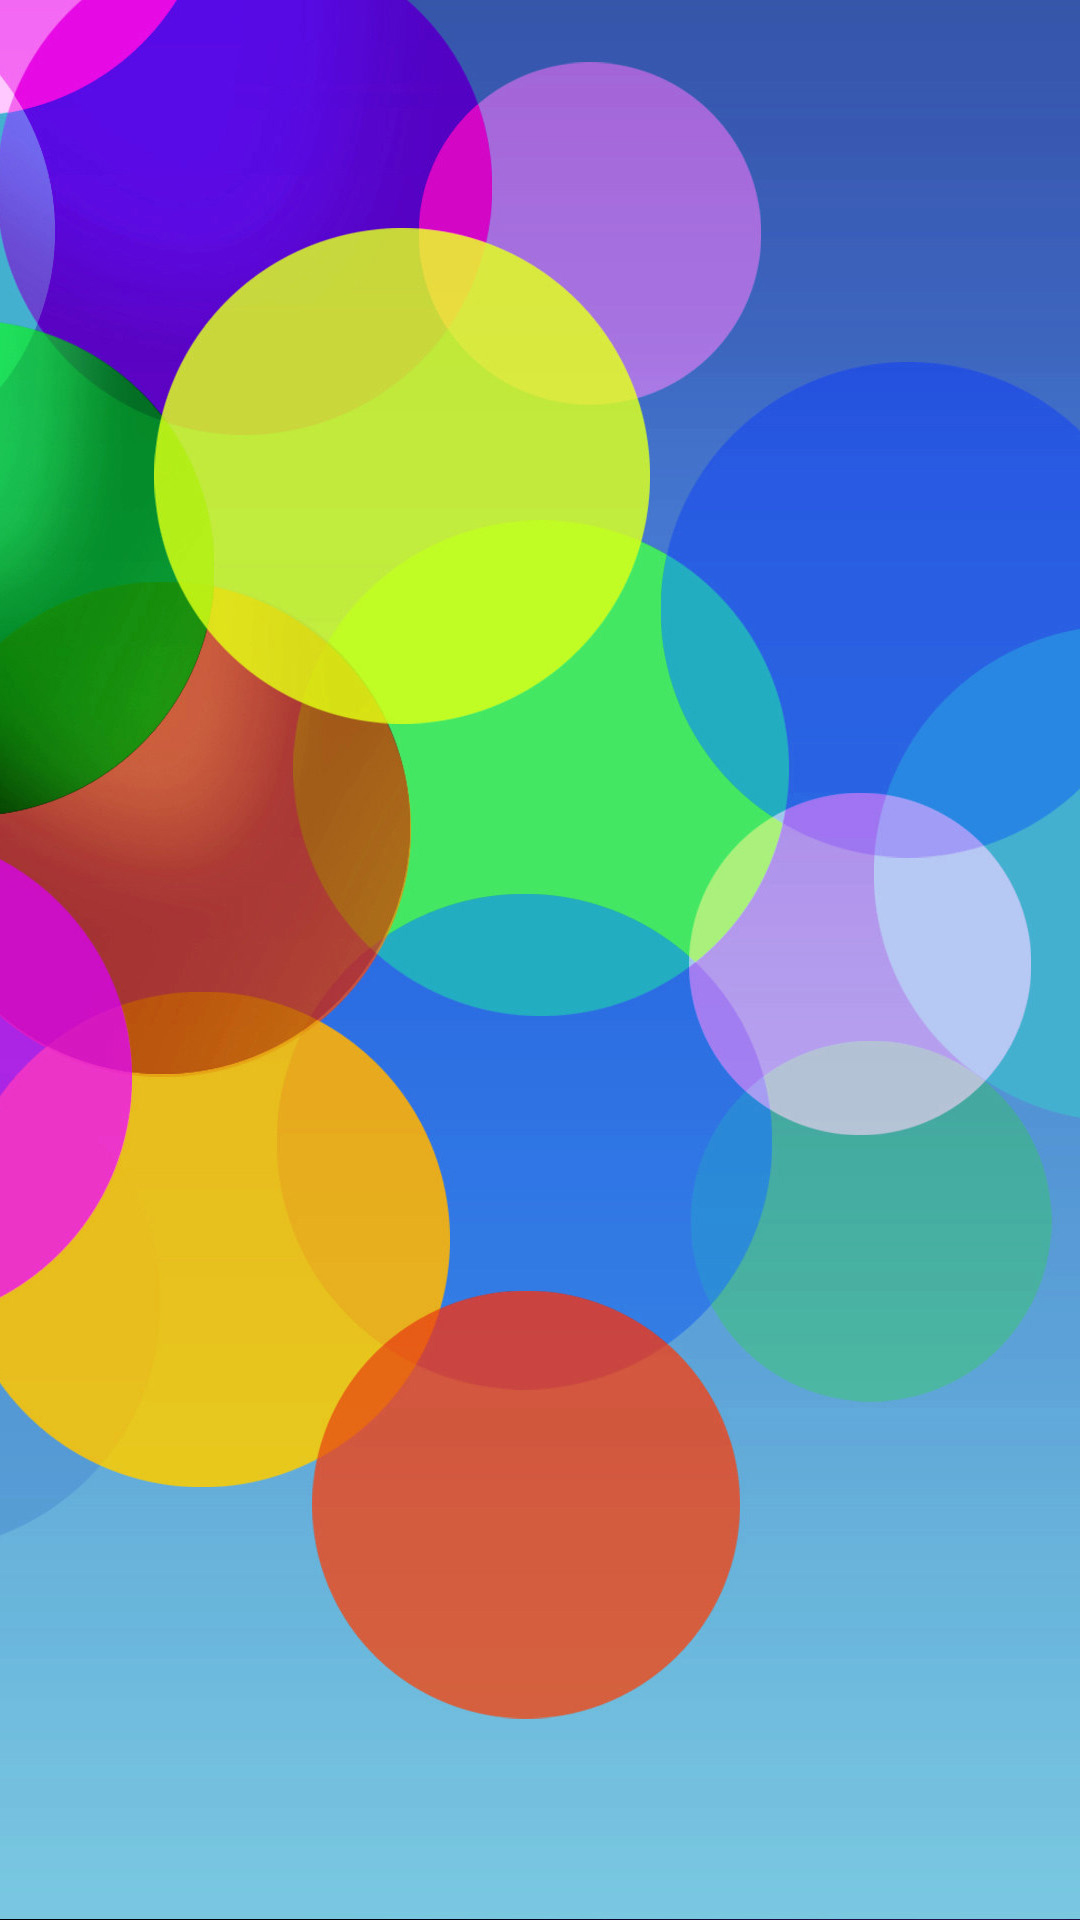 Colorful Bubbles Wallpaper Wallpapersafari